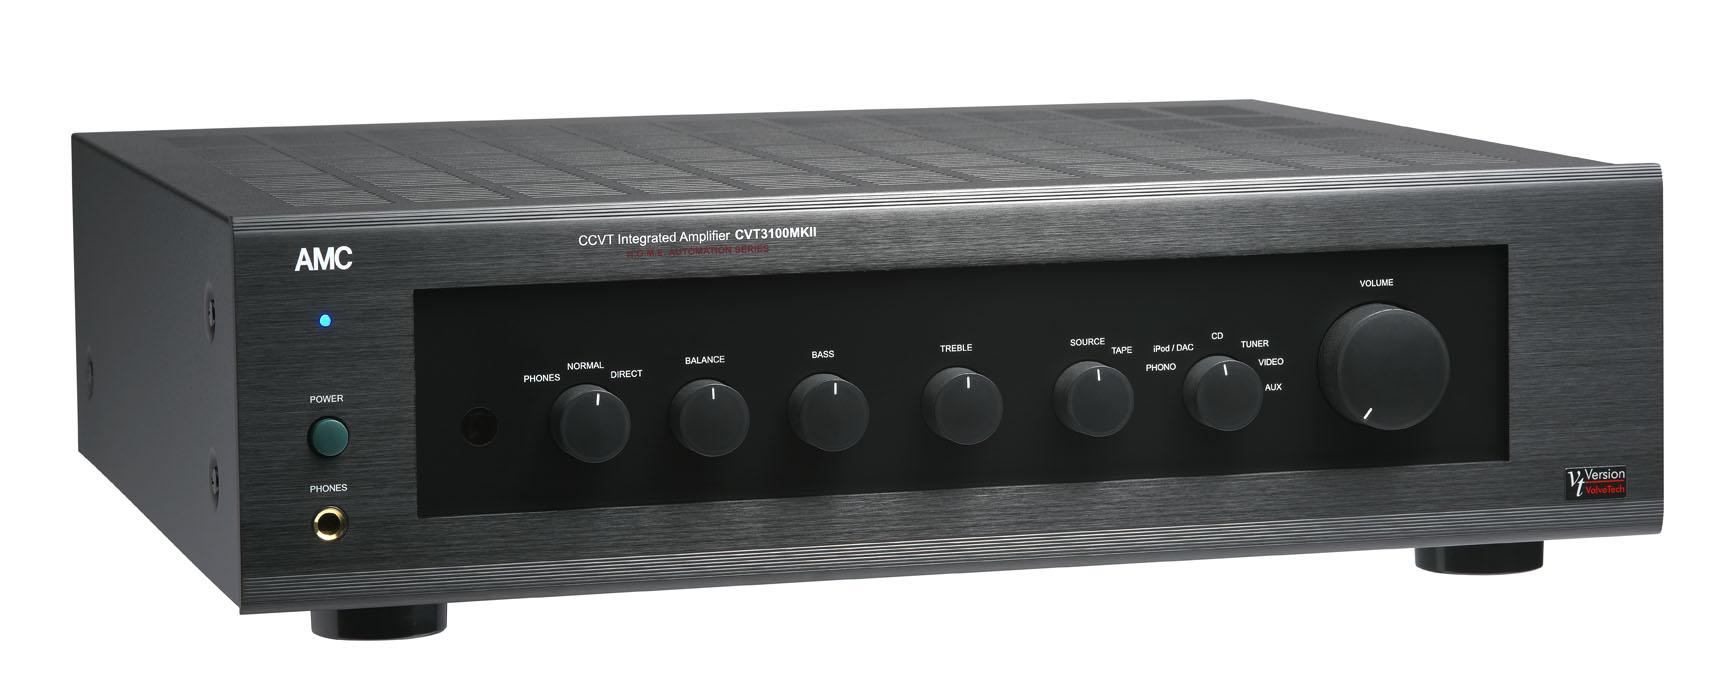 AMC CVT3100MKIIs 80W Integrated Tube Amp. At True Audiophile.